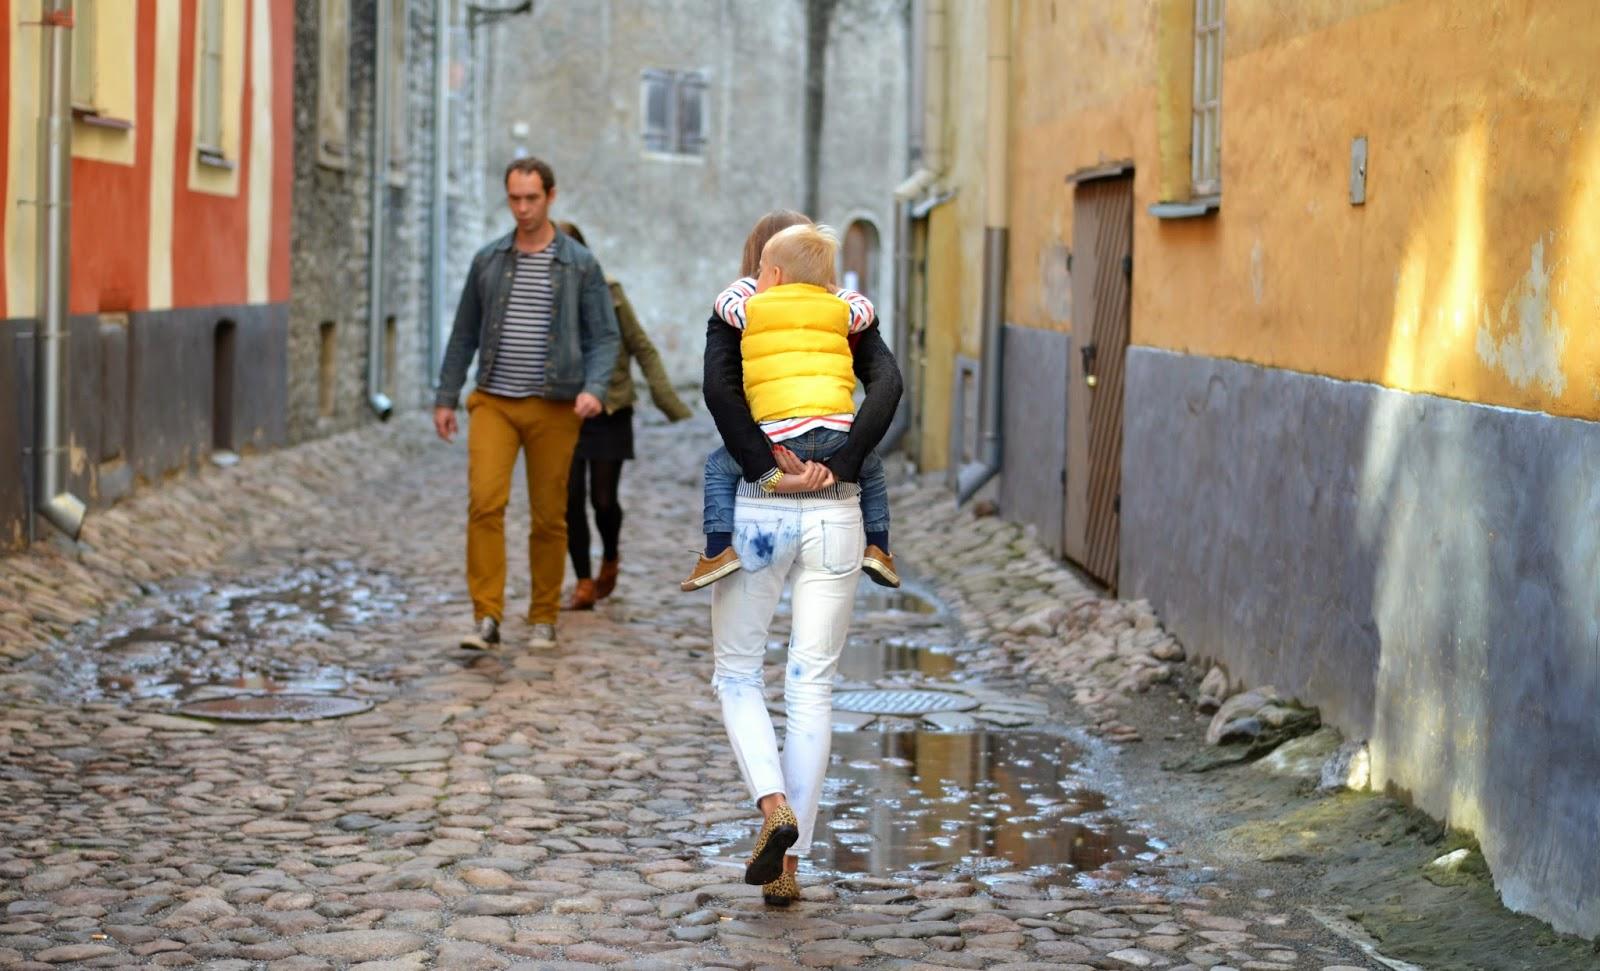 tallinn old town streets